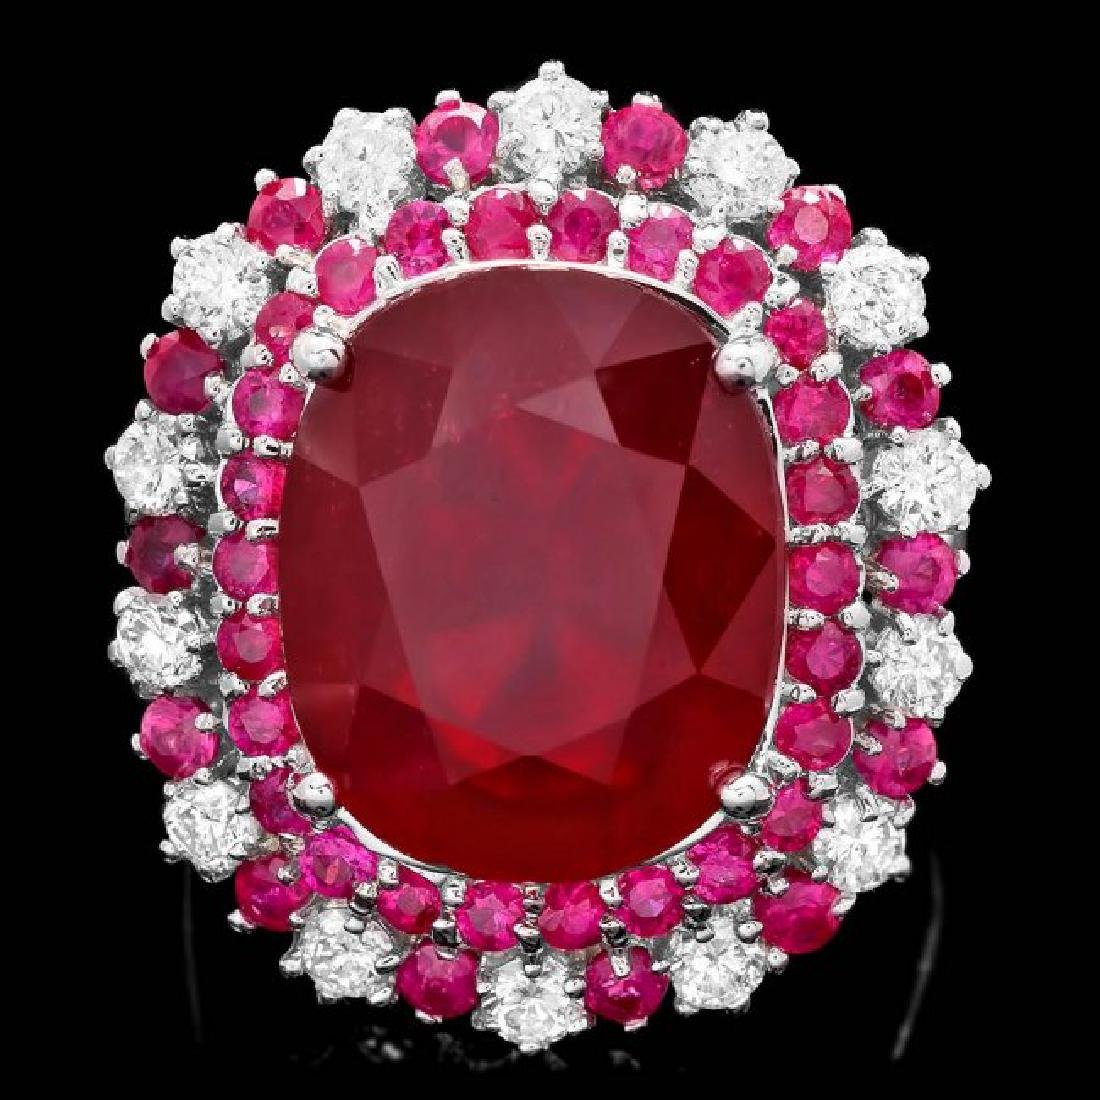 14k White Gold 17.5ct Ruby 0.88ct Diamond Ring